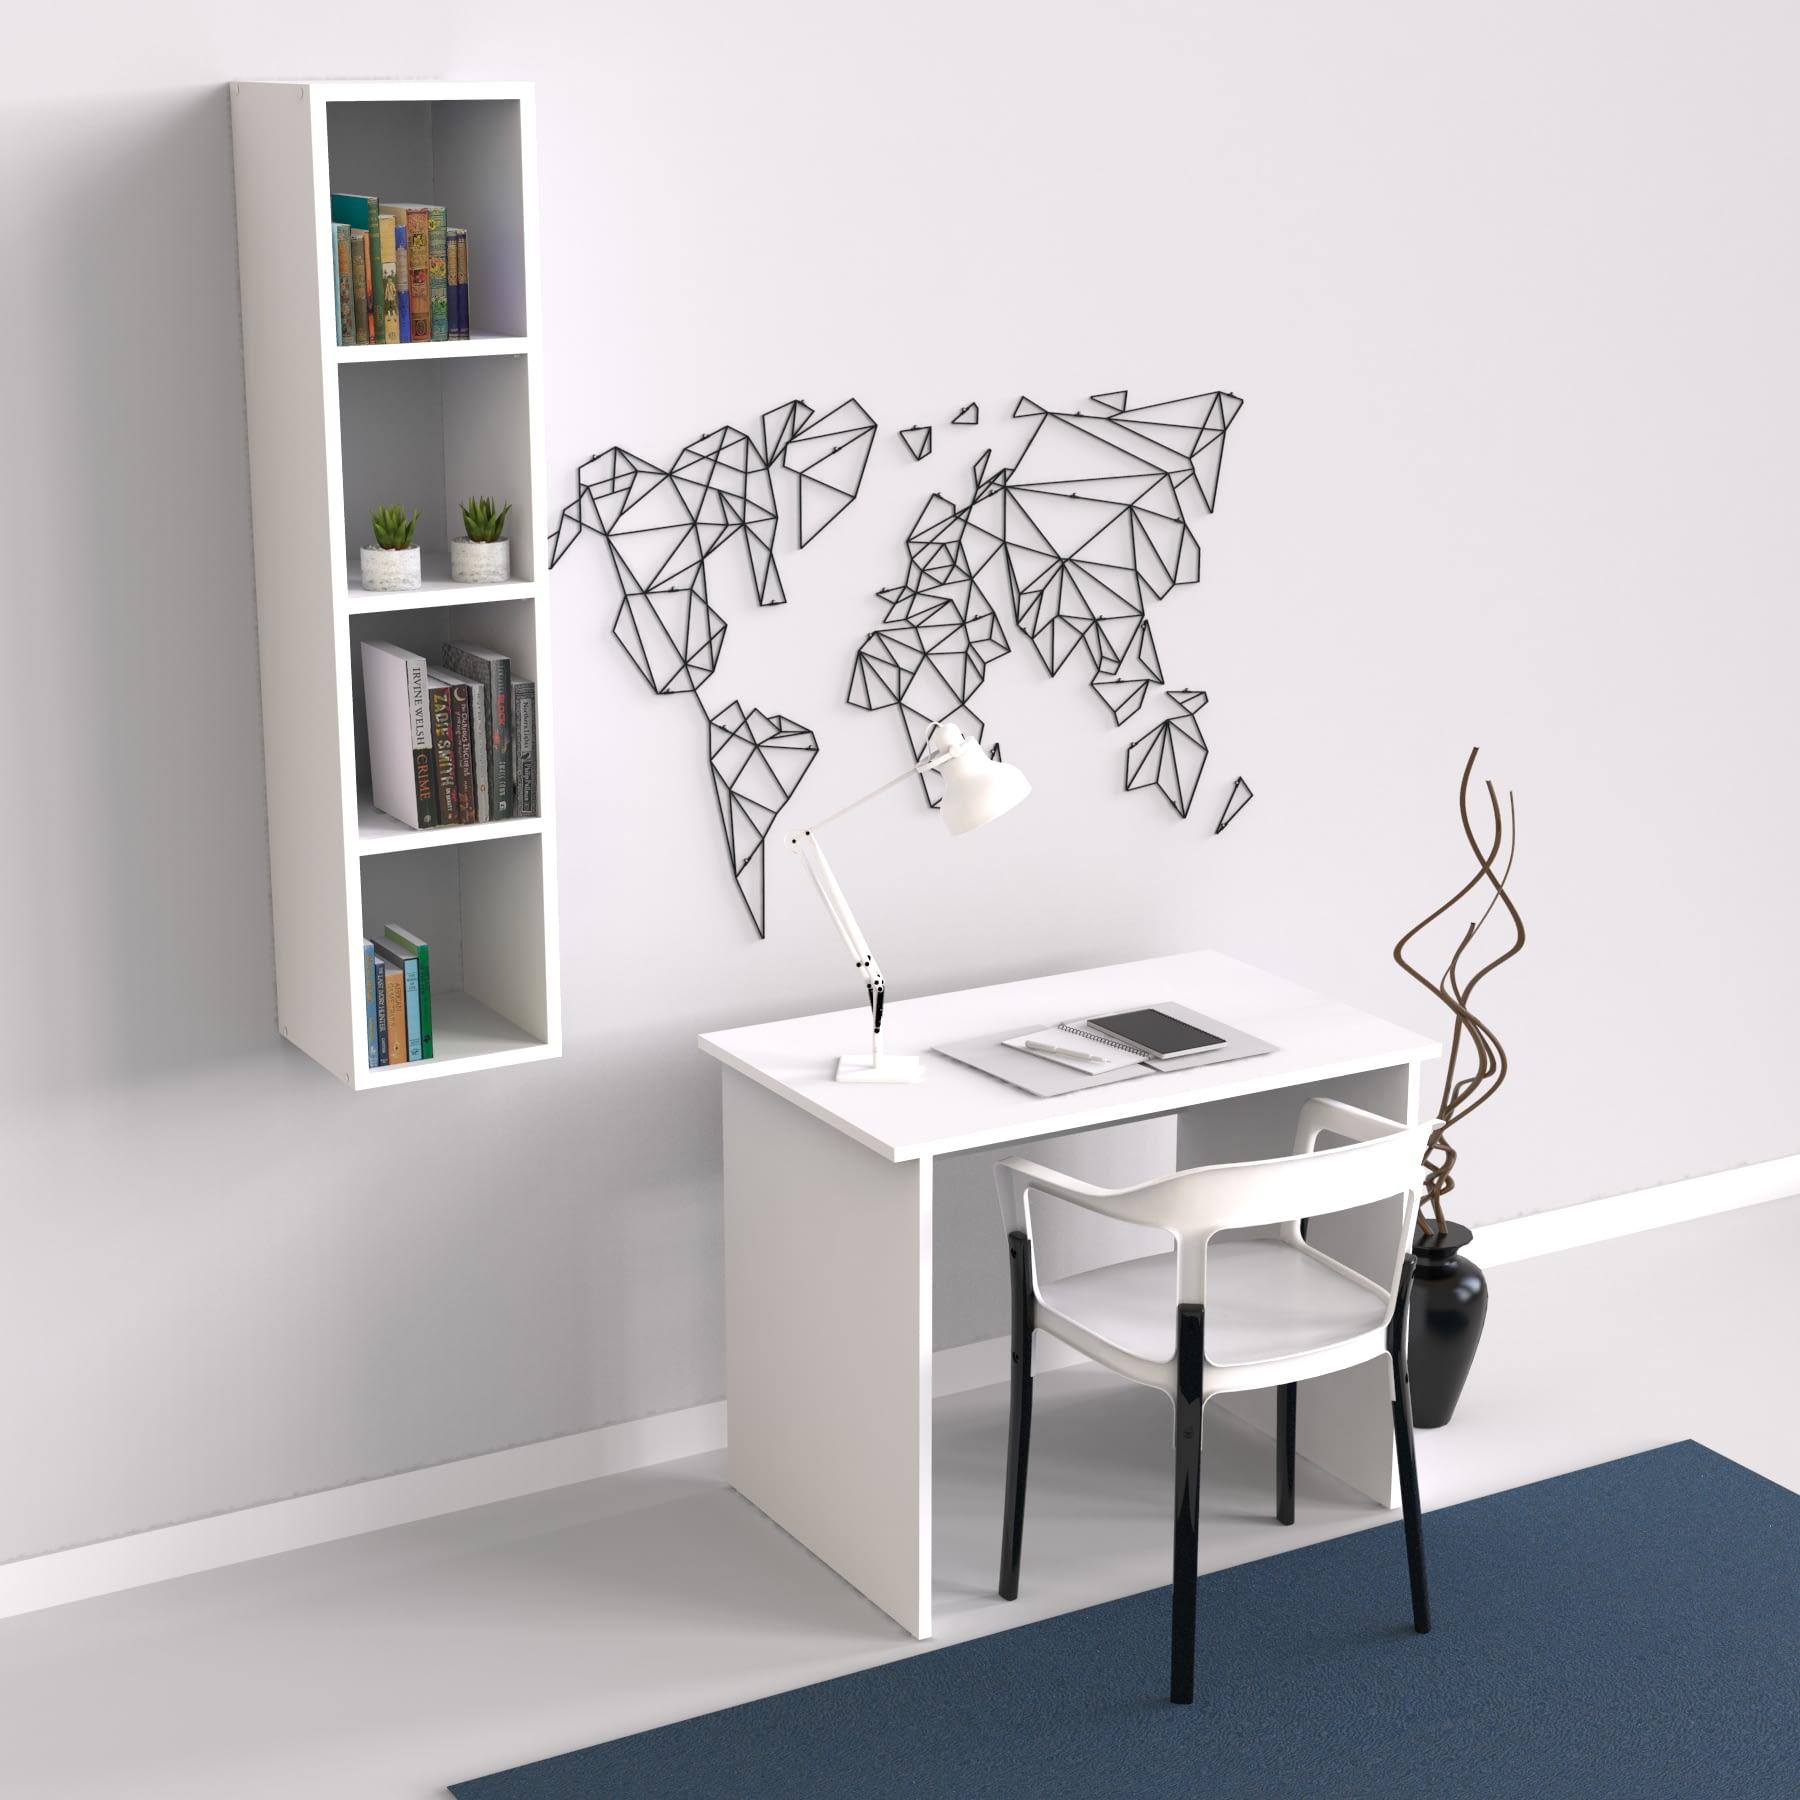 Mimilos R8 Decorative Shelf